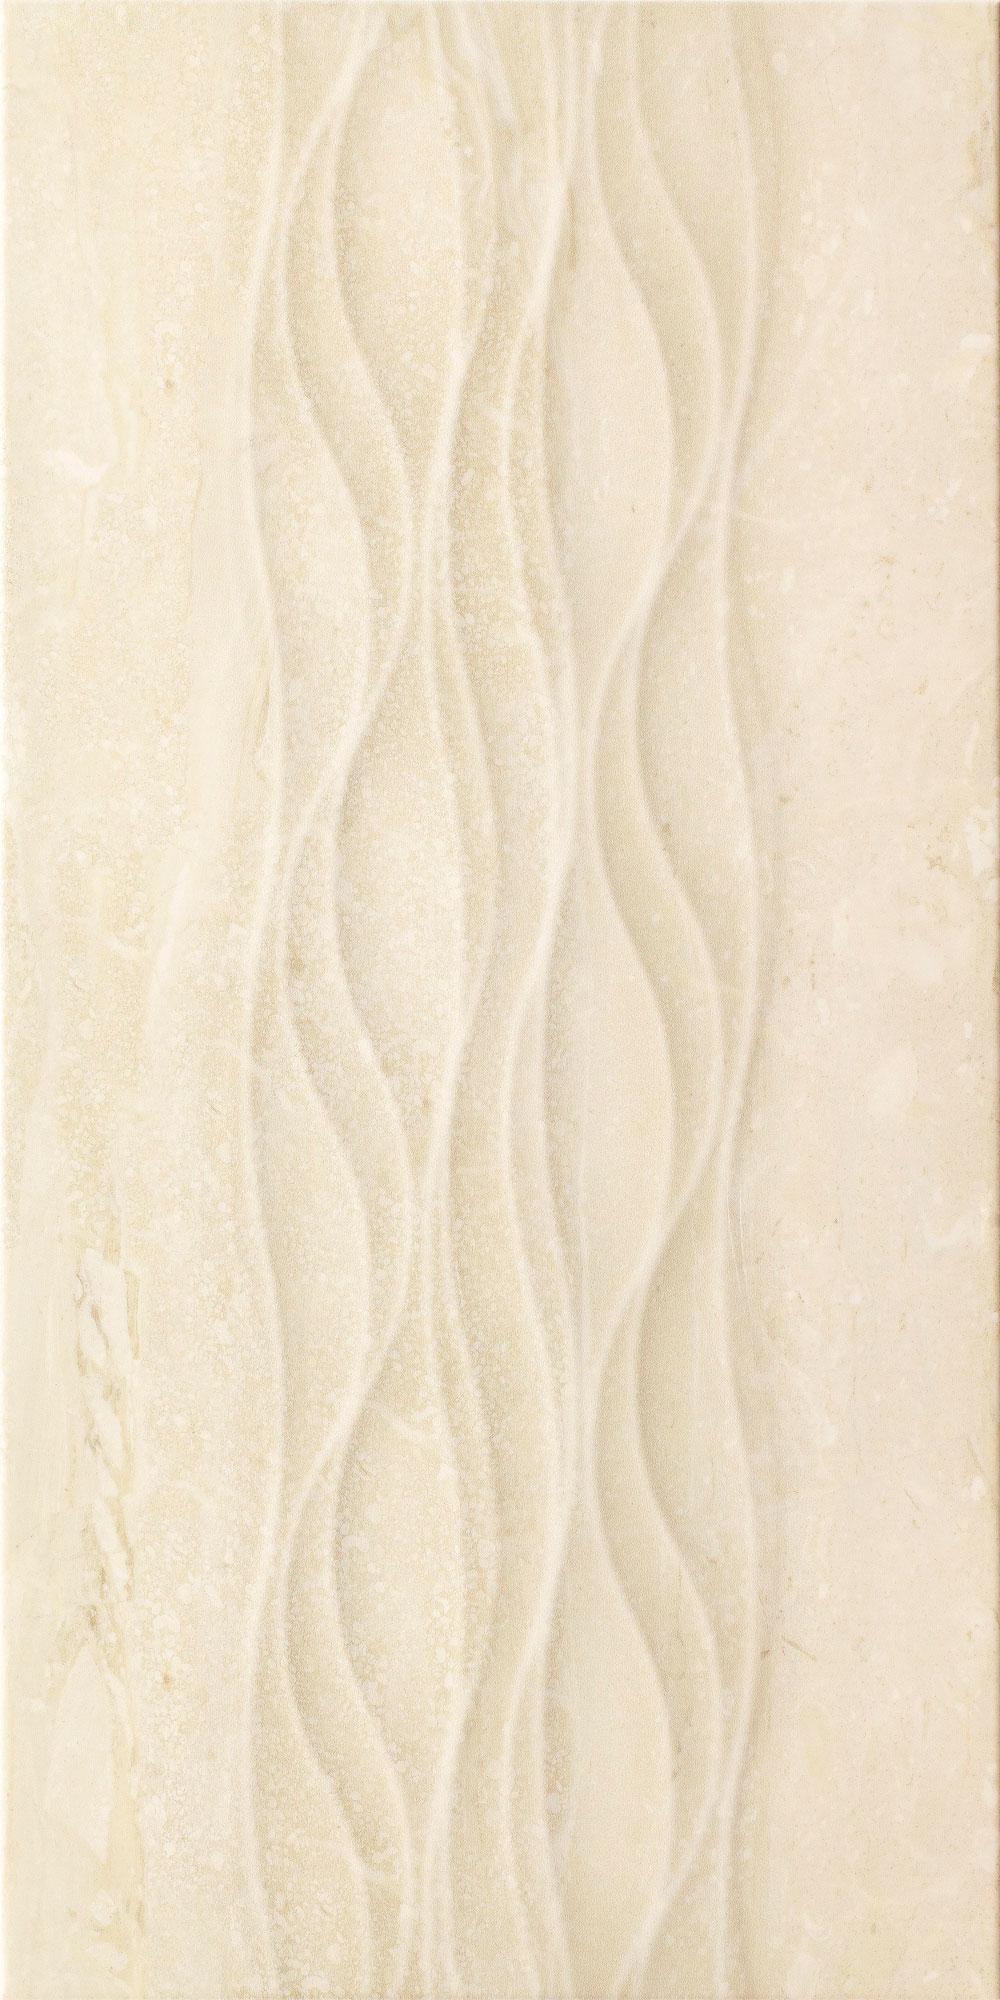 Настенная плитка Ceramika Paradyz Coraline Beige struktura 30x60 (1,44) декор polcolorit dream beige caro 30x60